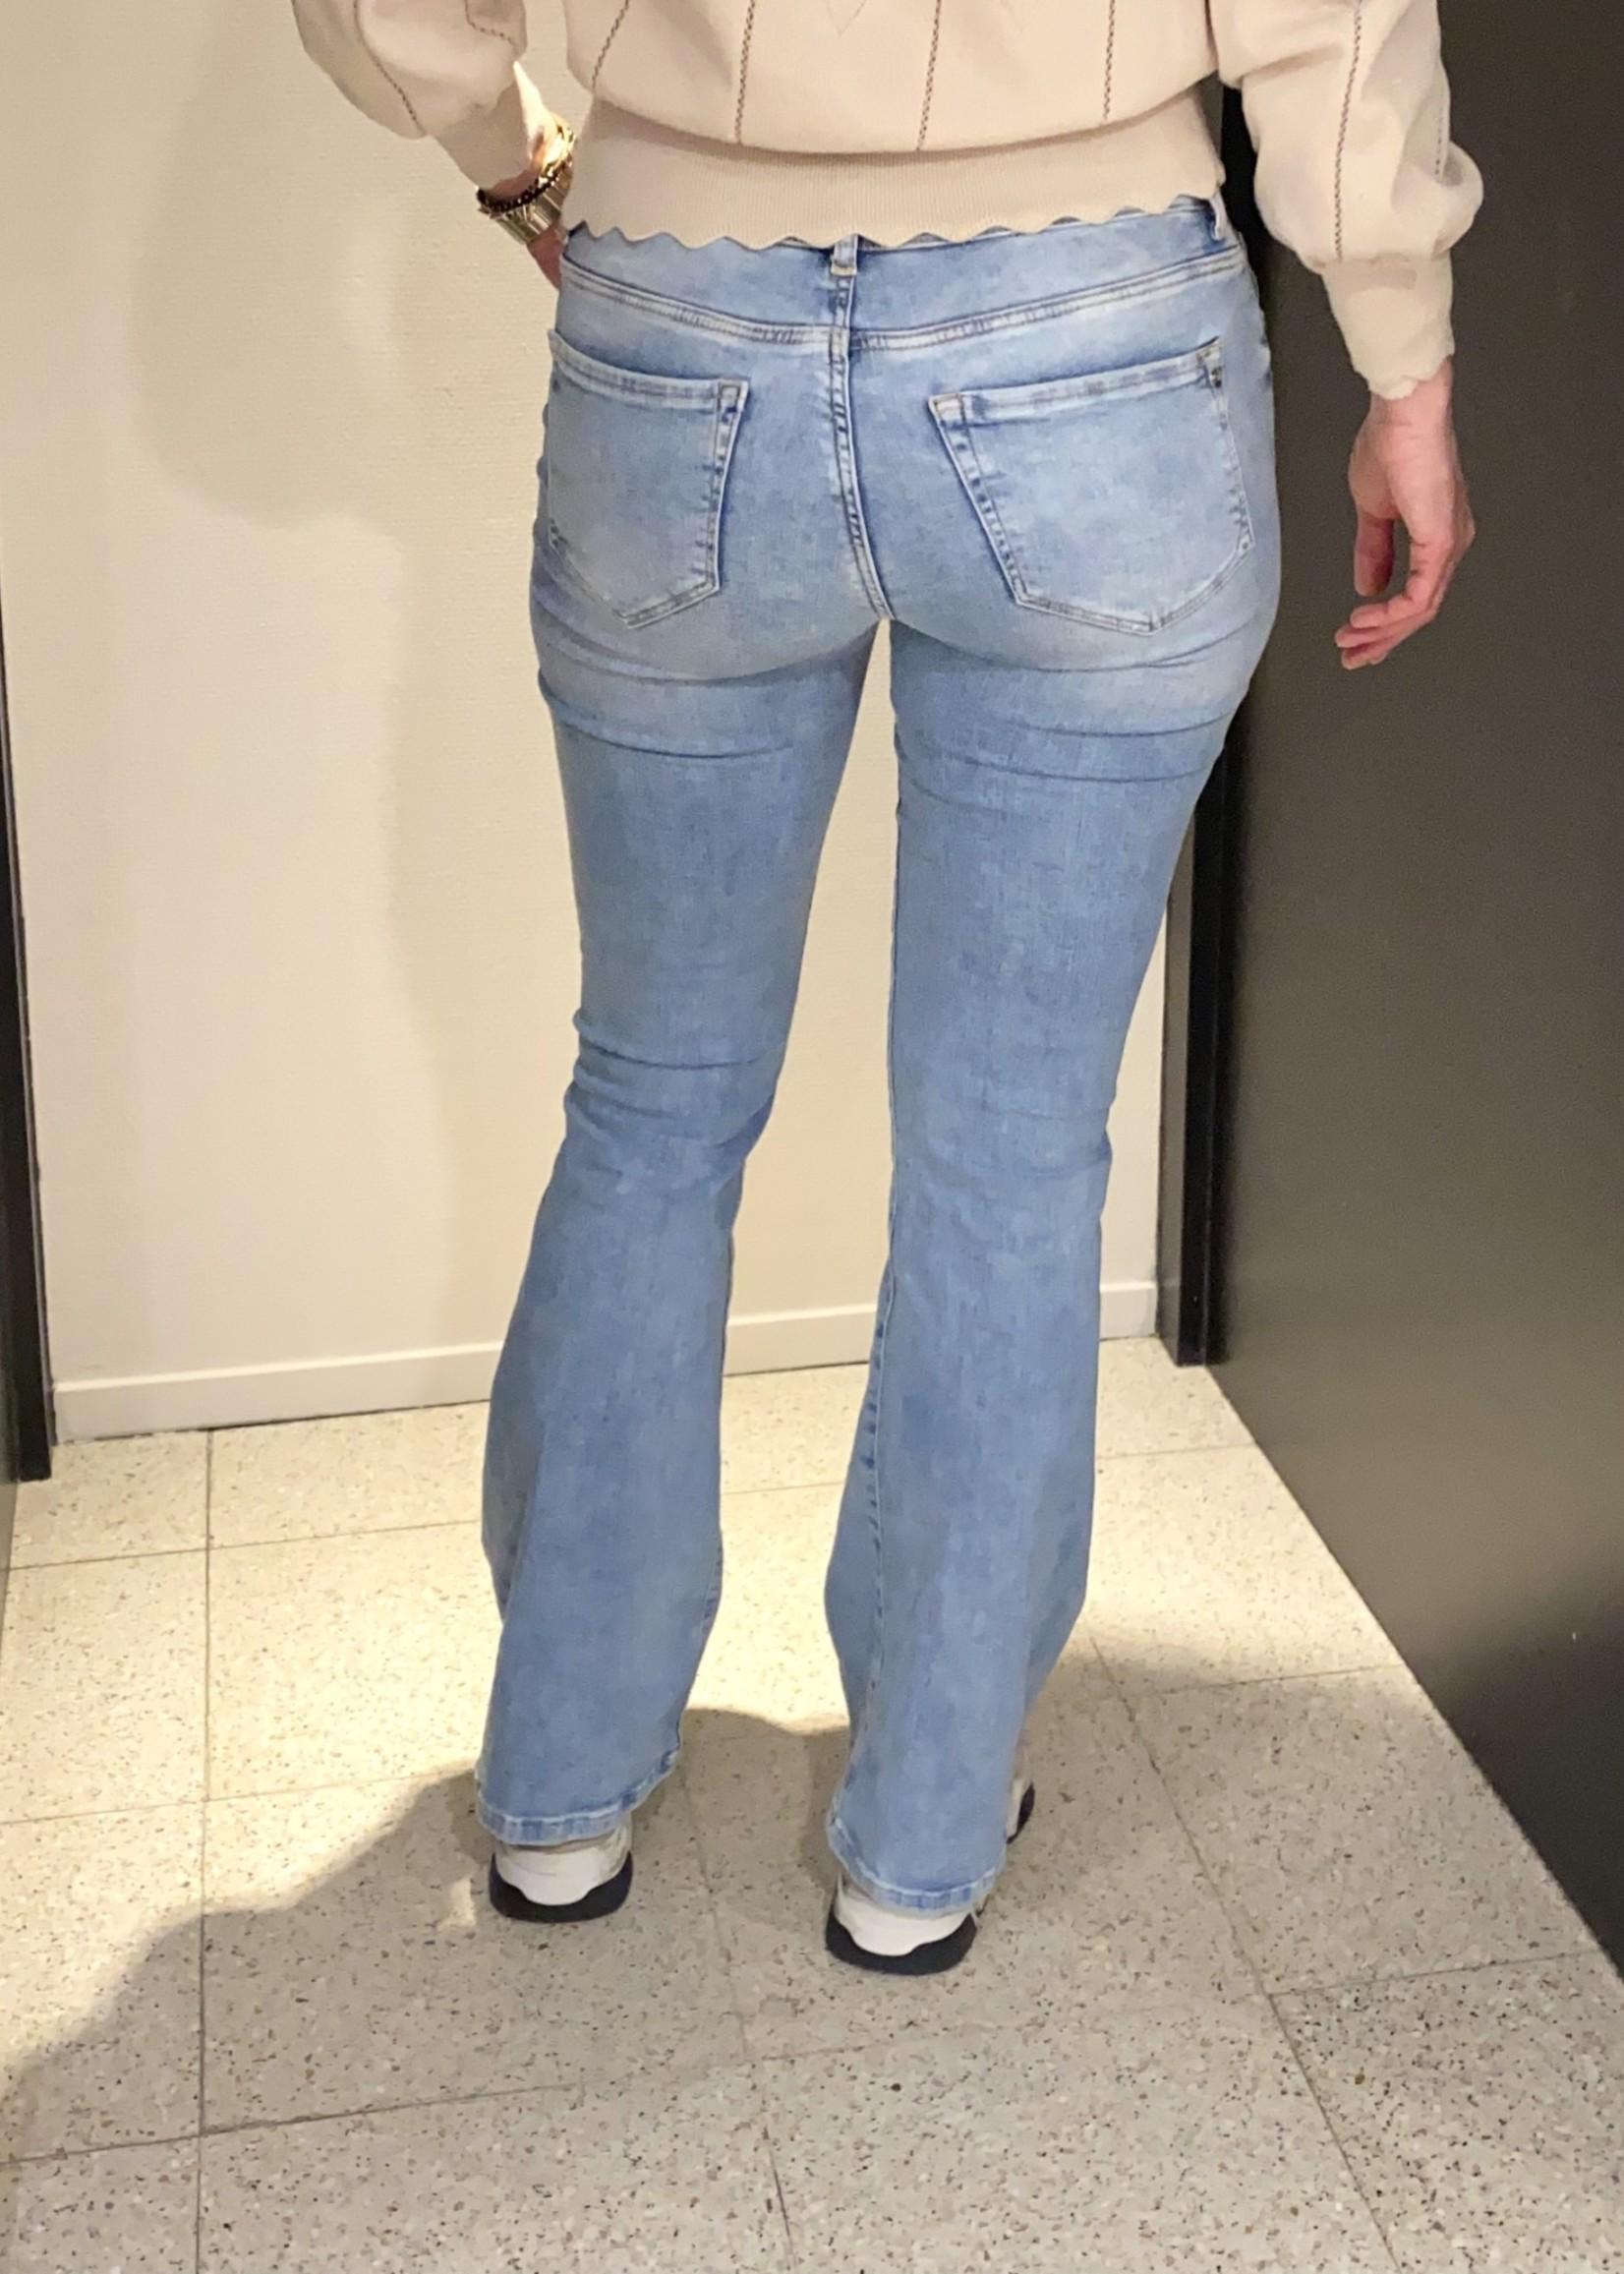 CUP OF JOE JEANS Laura flared jeans light blue vintage L32